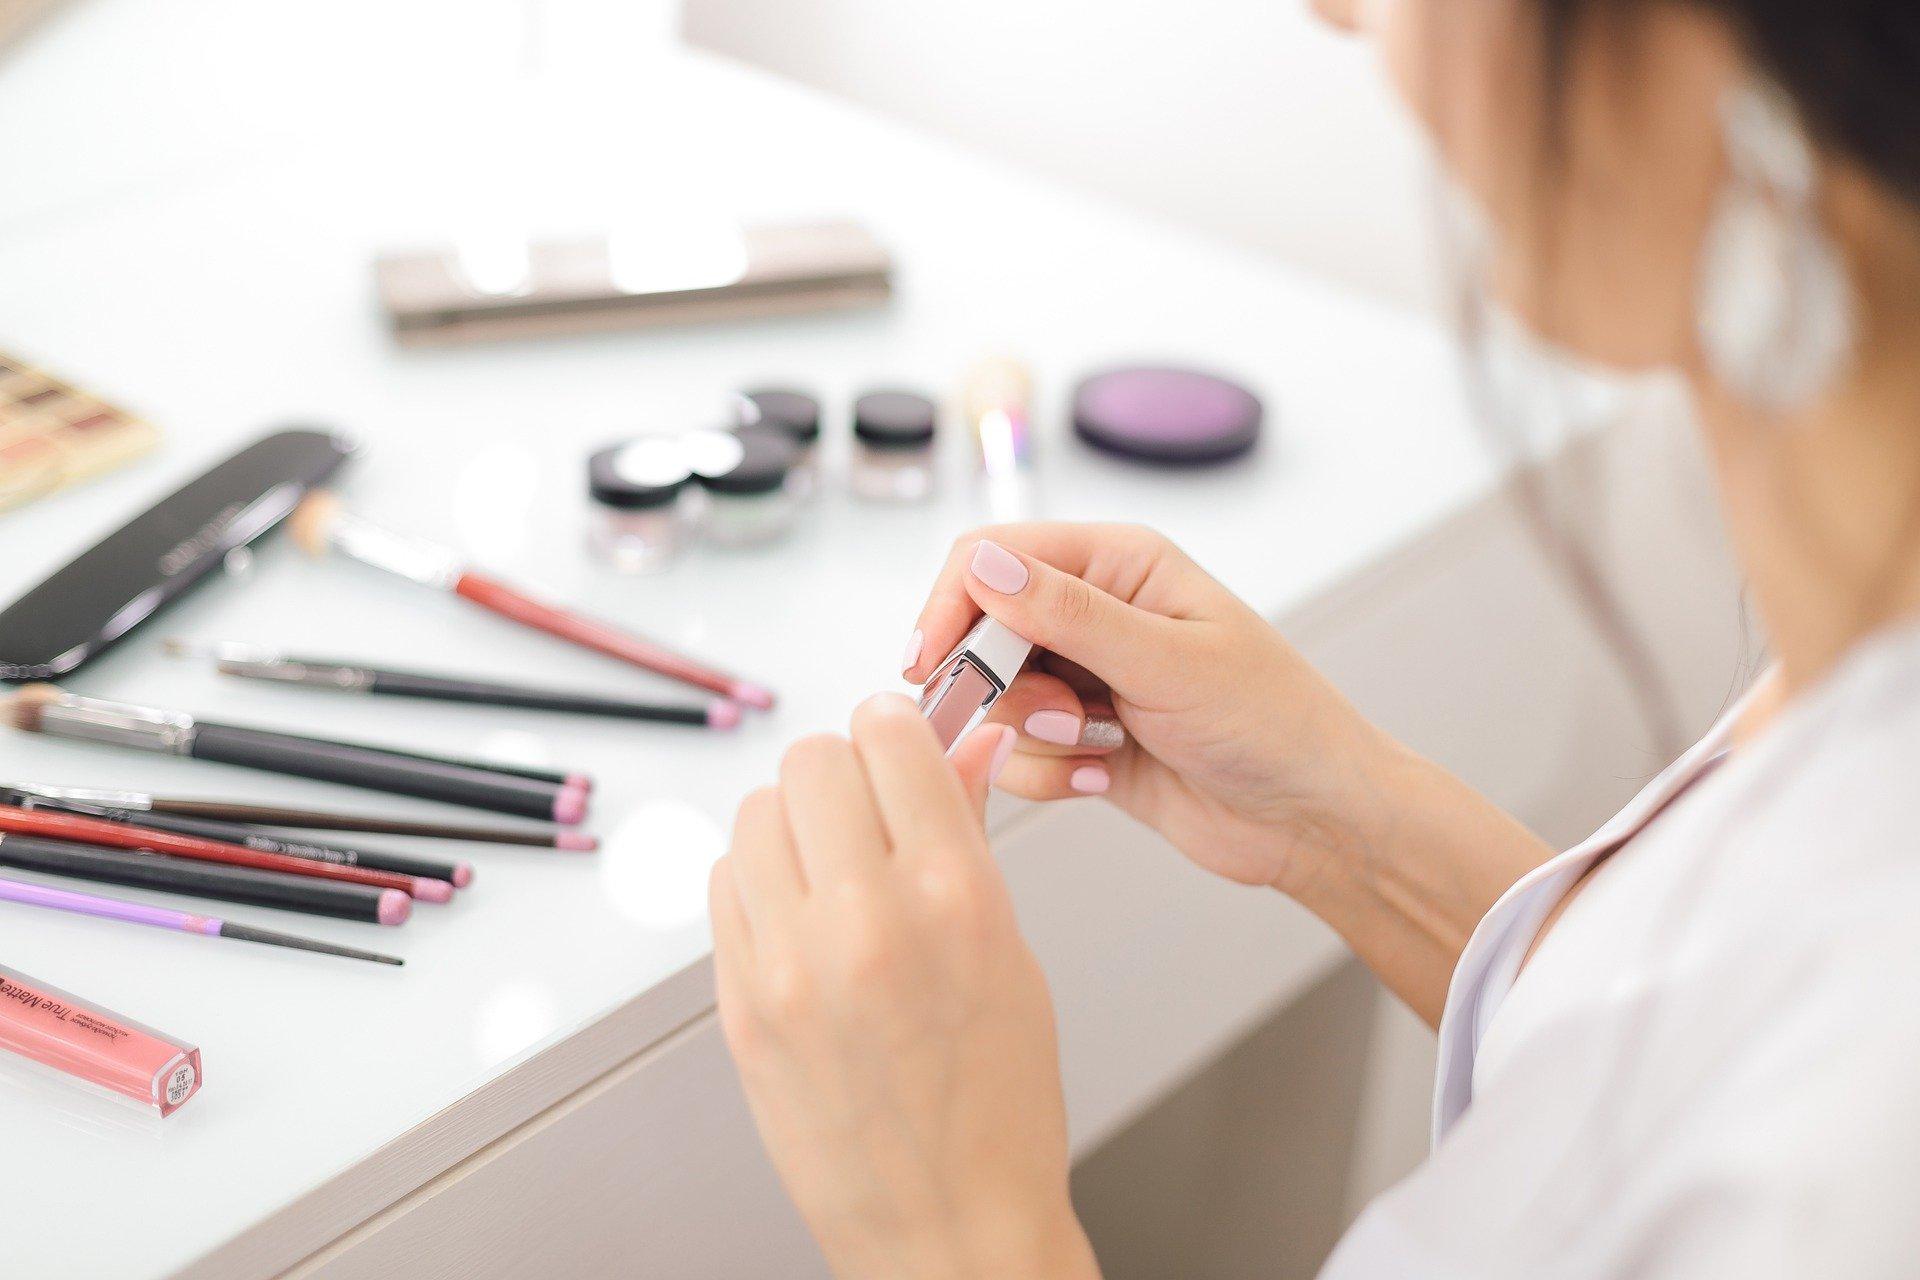 Realidad Aumentada e IA fortalecerán canal de ventas de productos de belleza